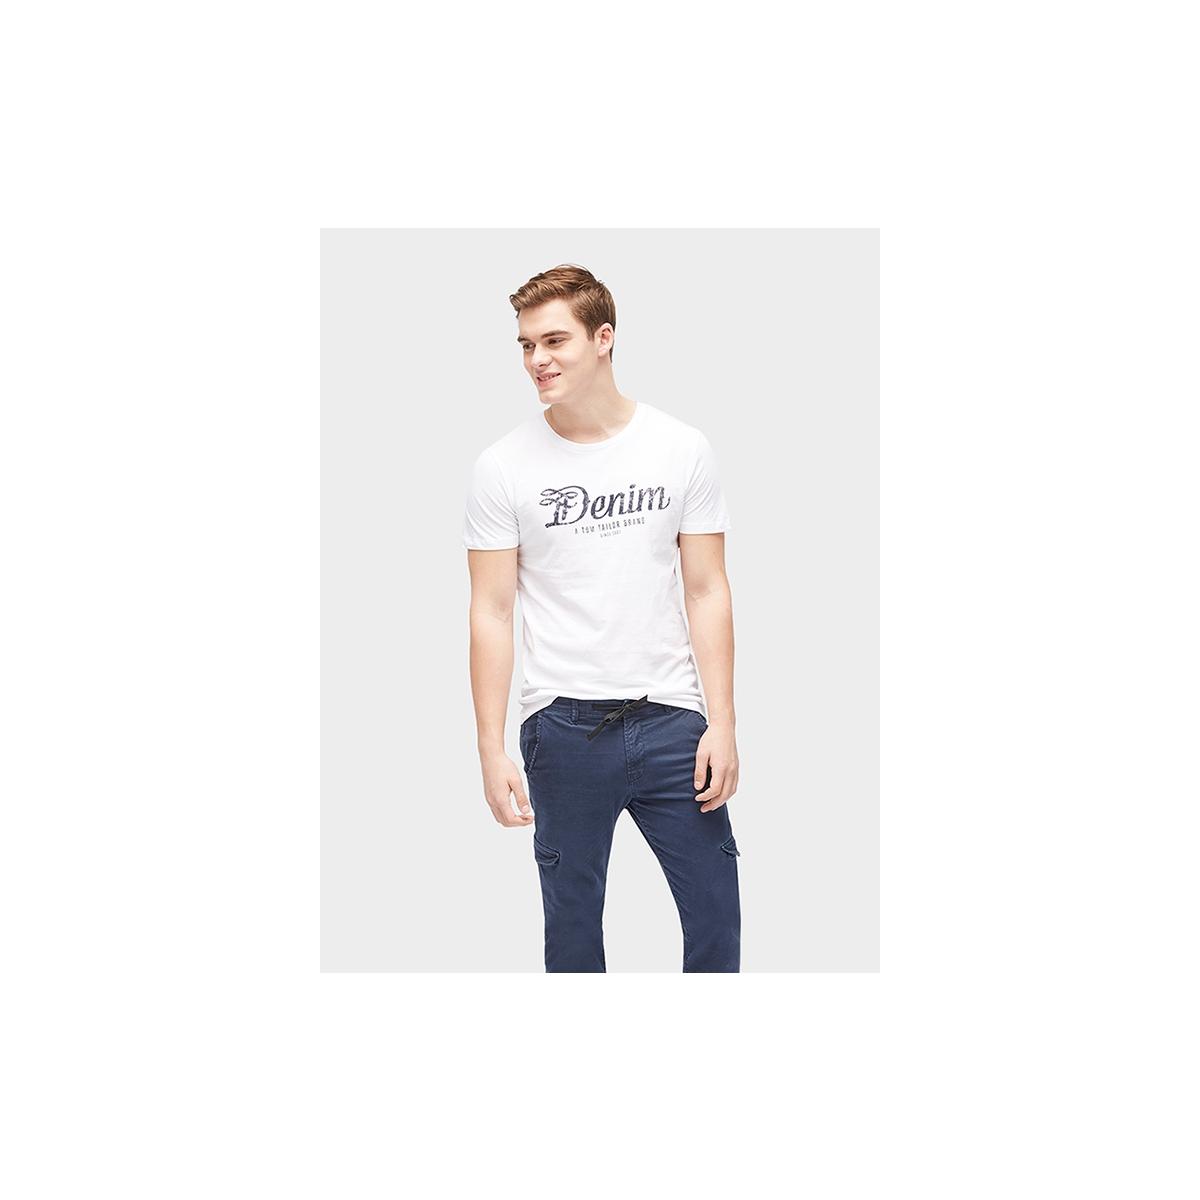 1055467.09.12 tom tailor t-shirt 2000